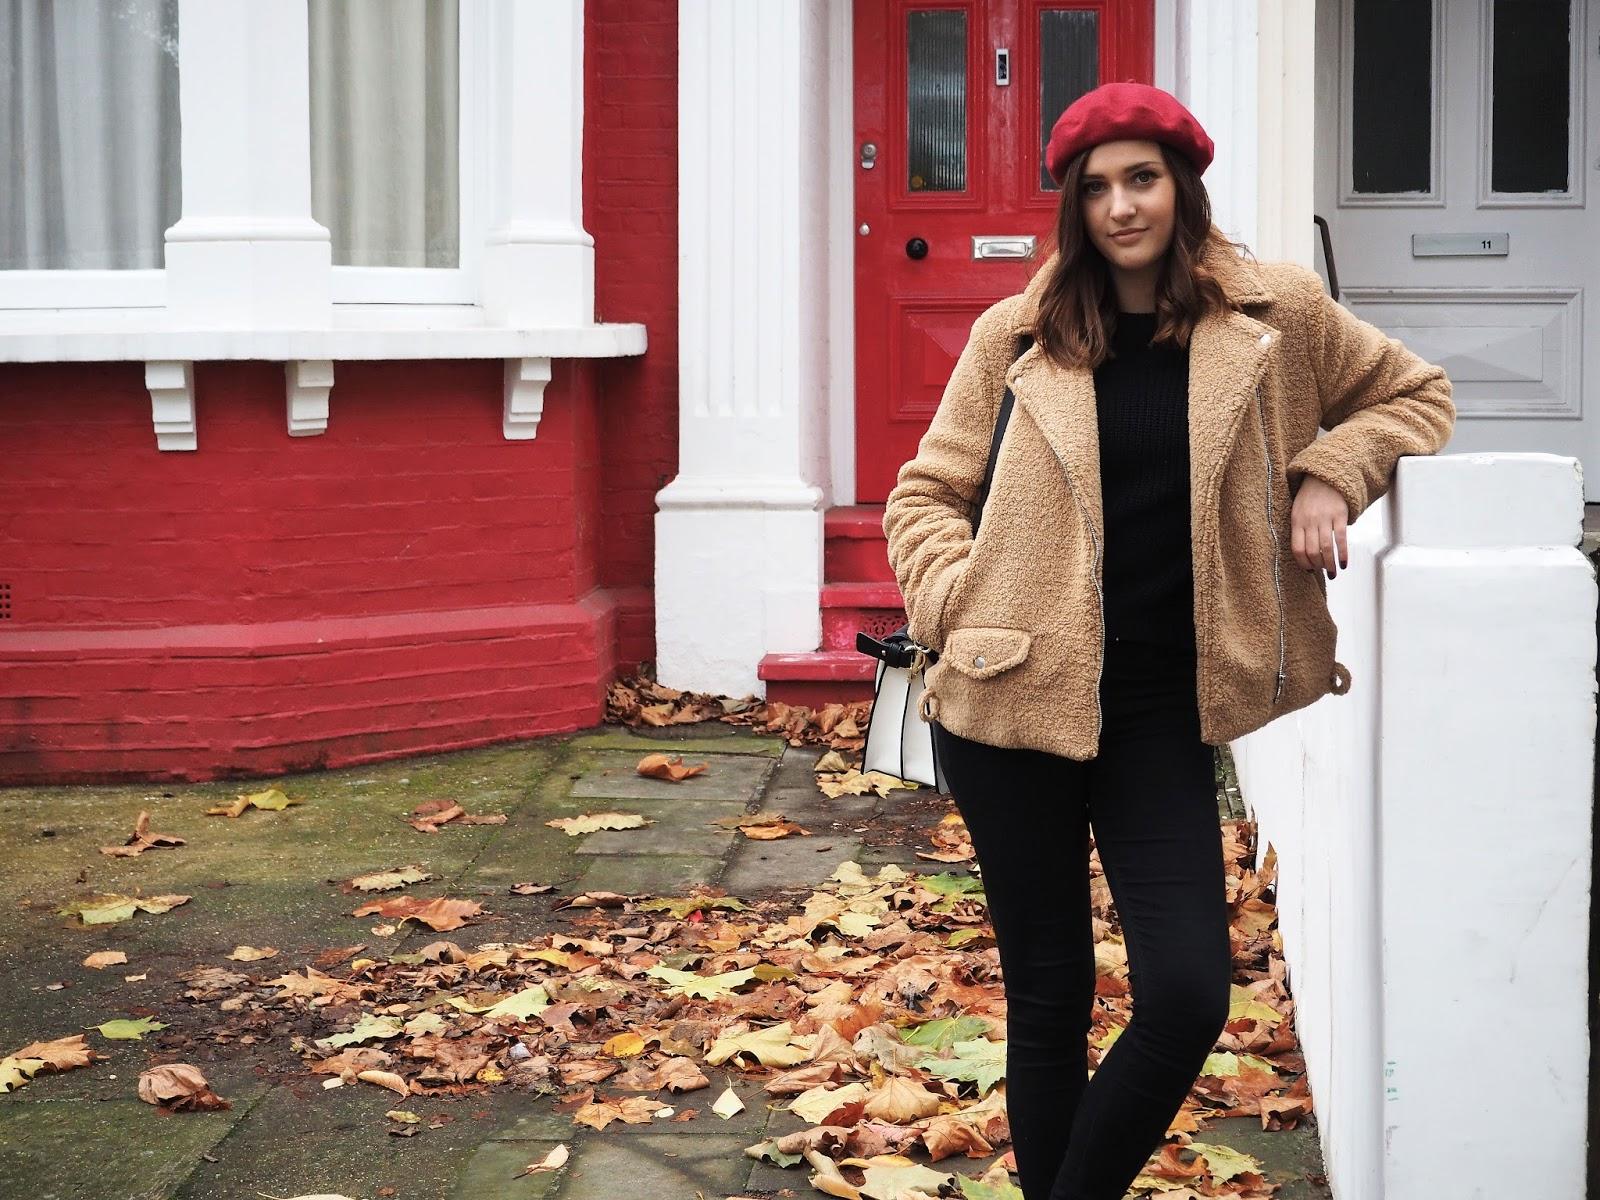 Autumn Style - Teddy Bear Coat Missguided - LAUREN ROSE STYLE - Fashion Blogger - London Street Style